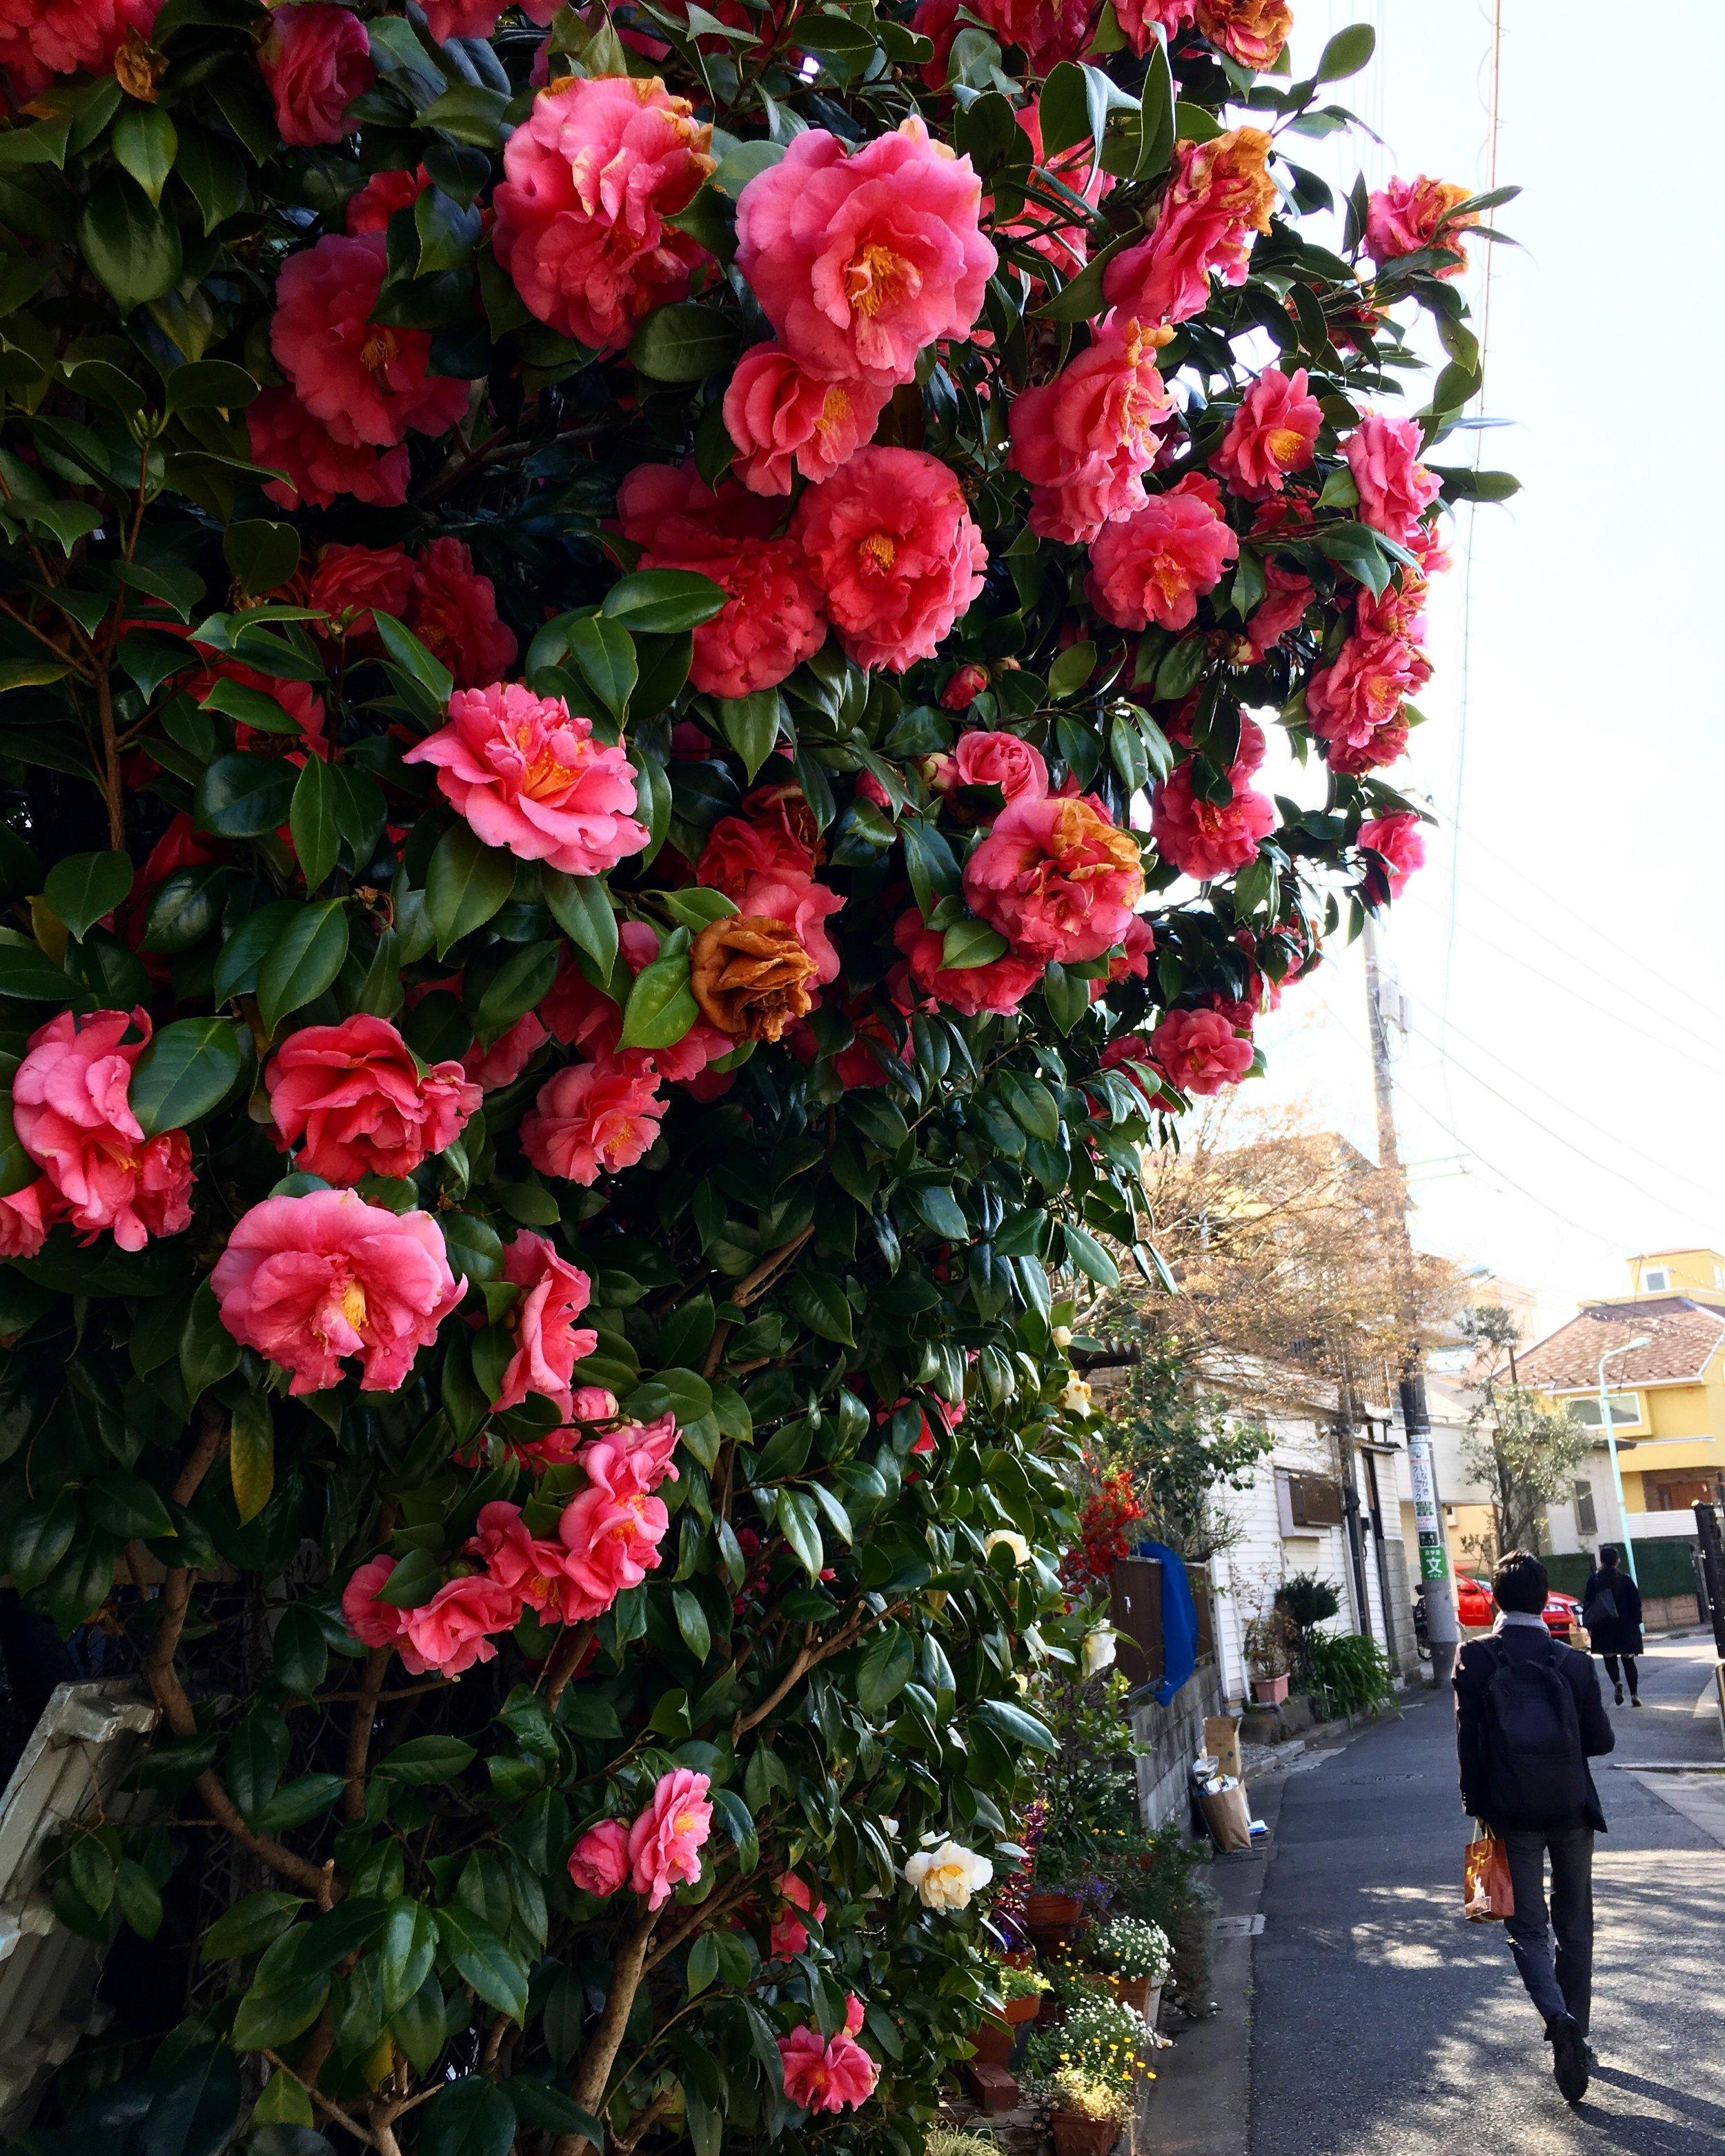 My first love - Tokyo, Japan